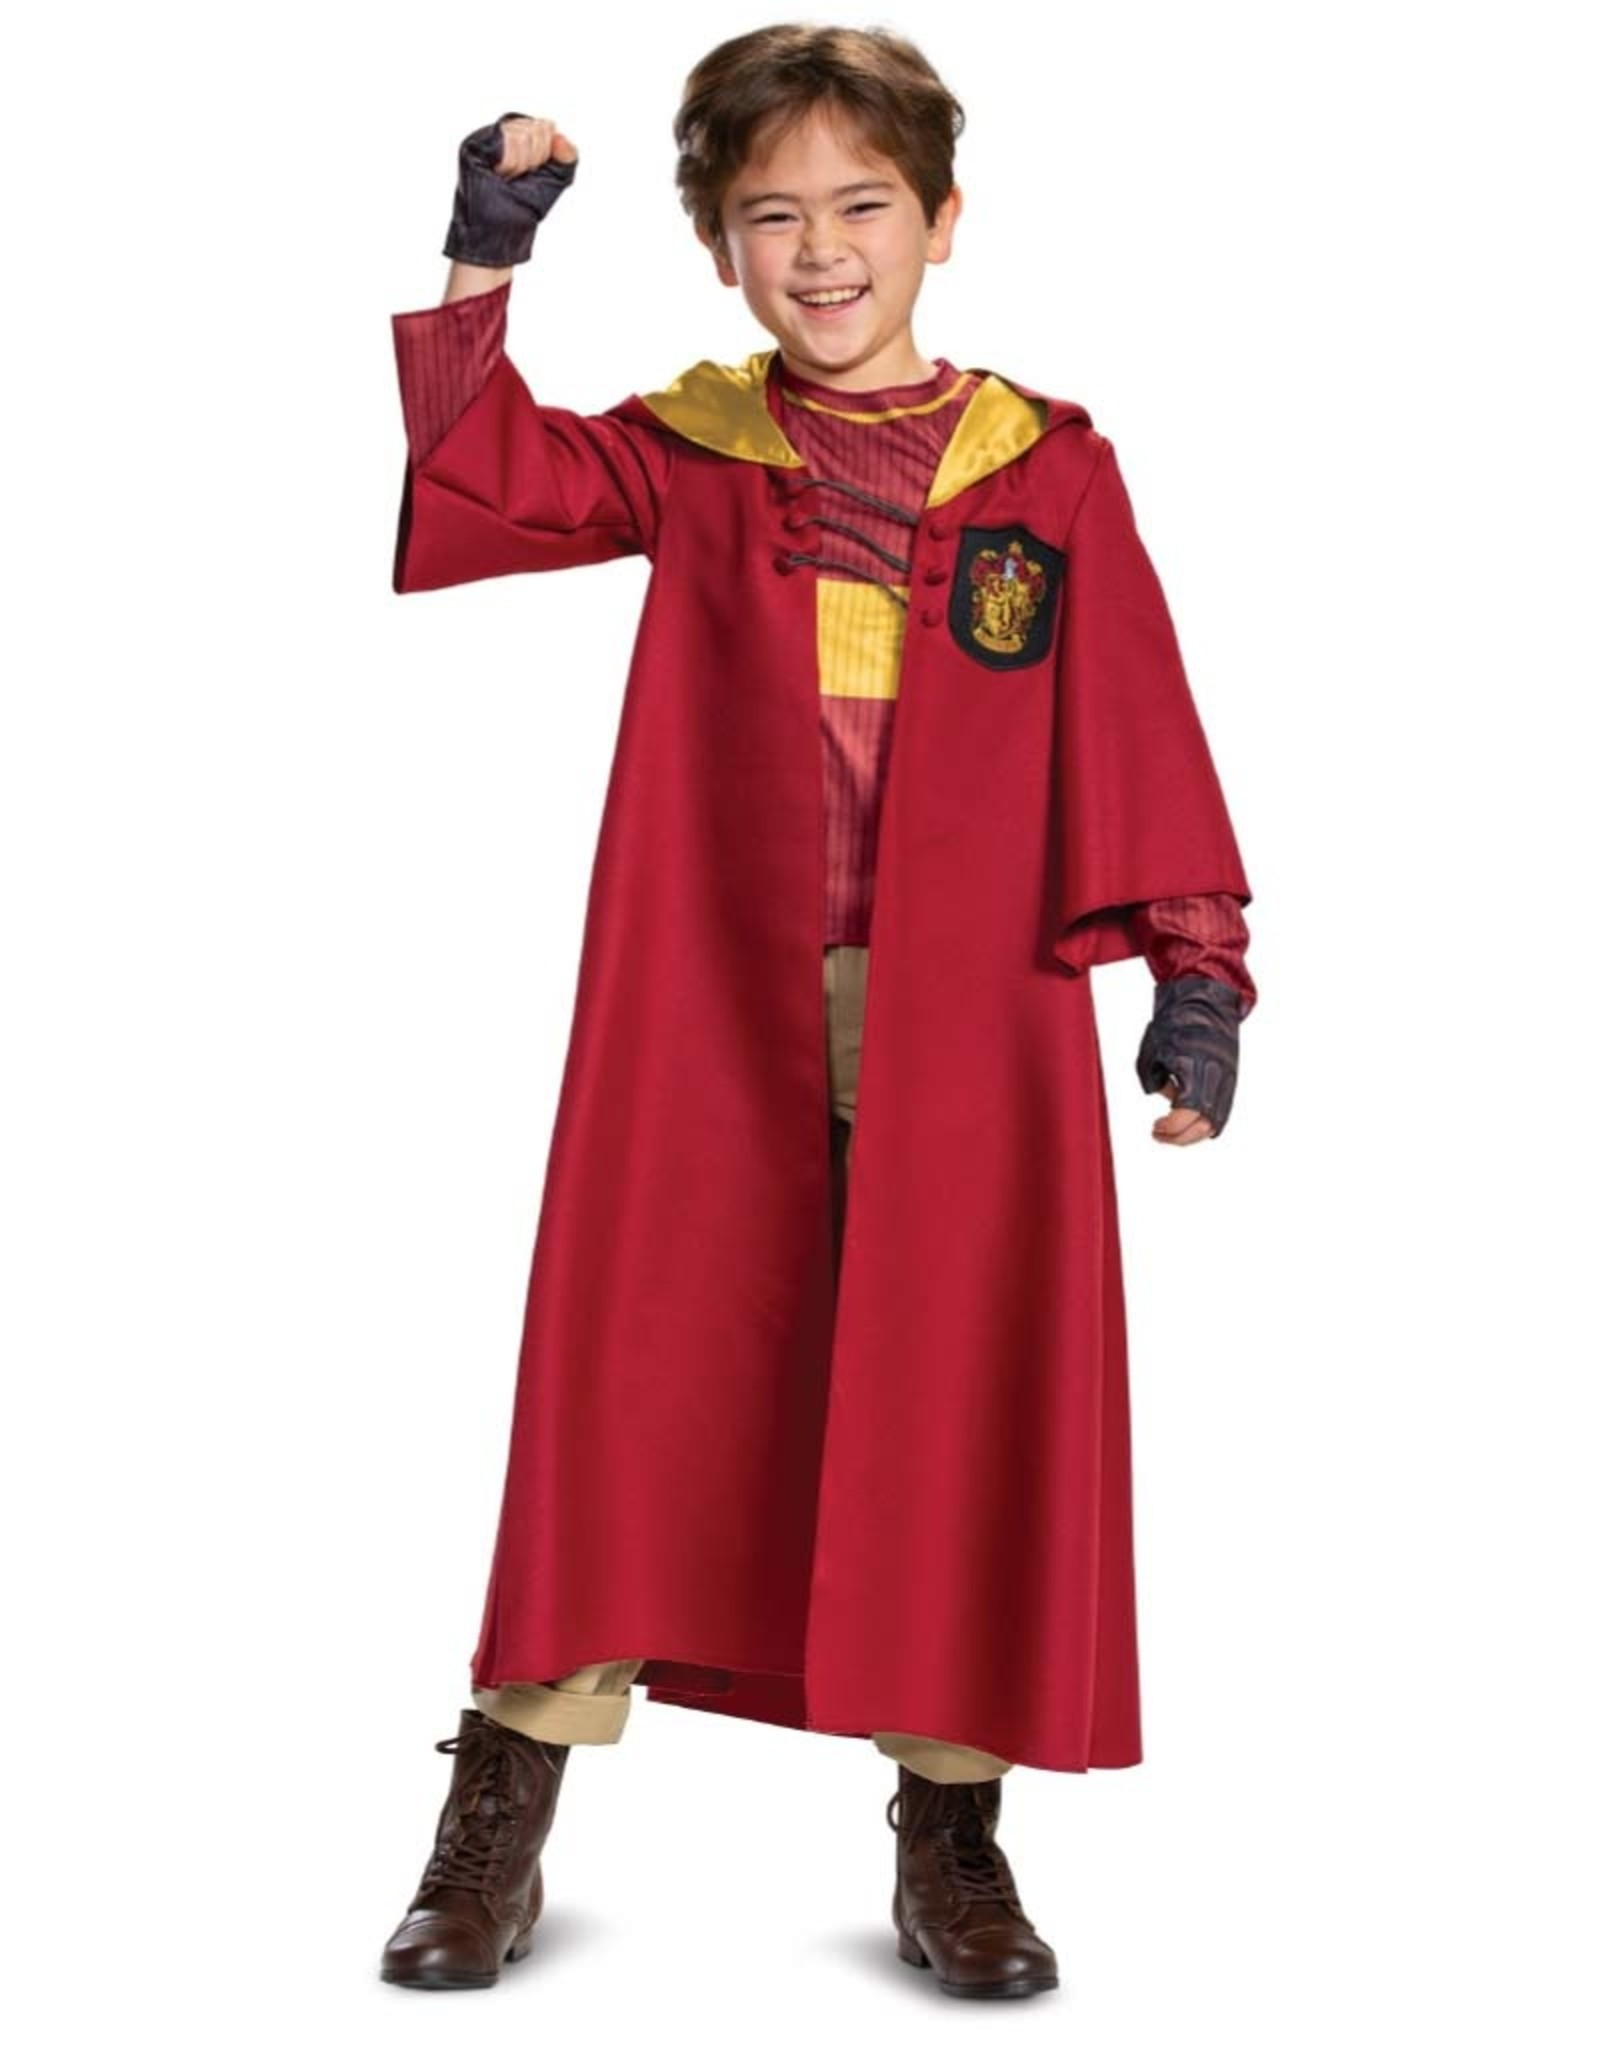 DISGUISE Gryfindor Quidditch - Boys